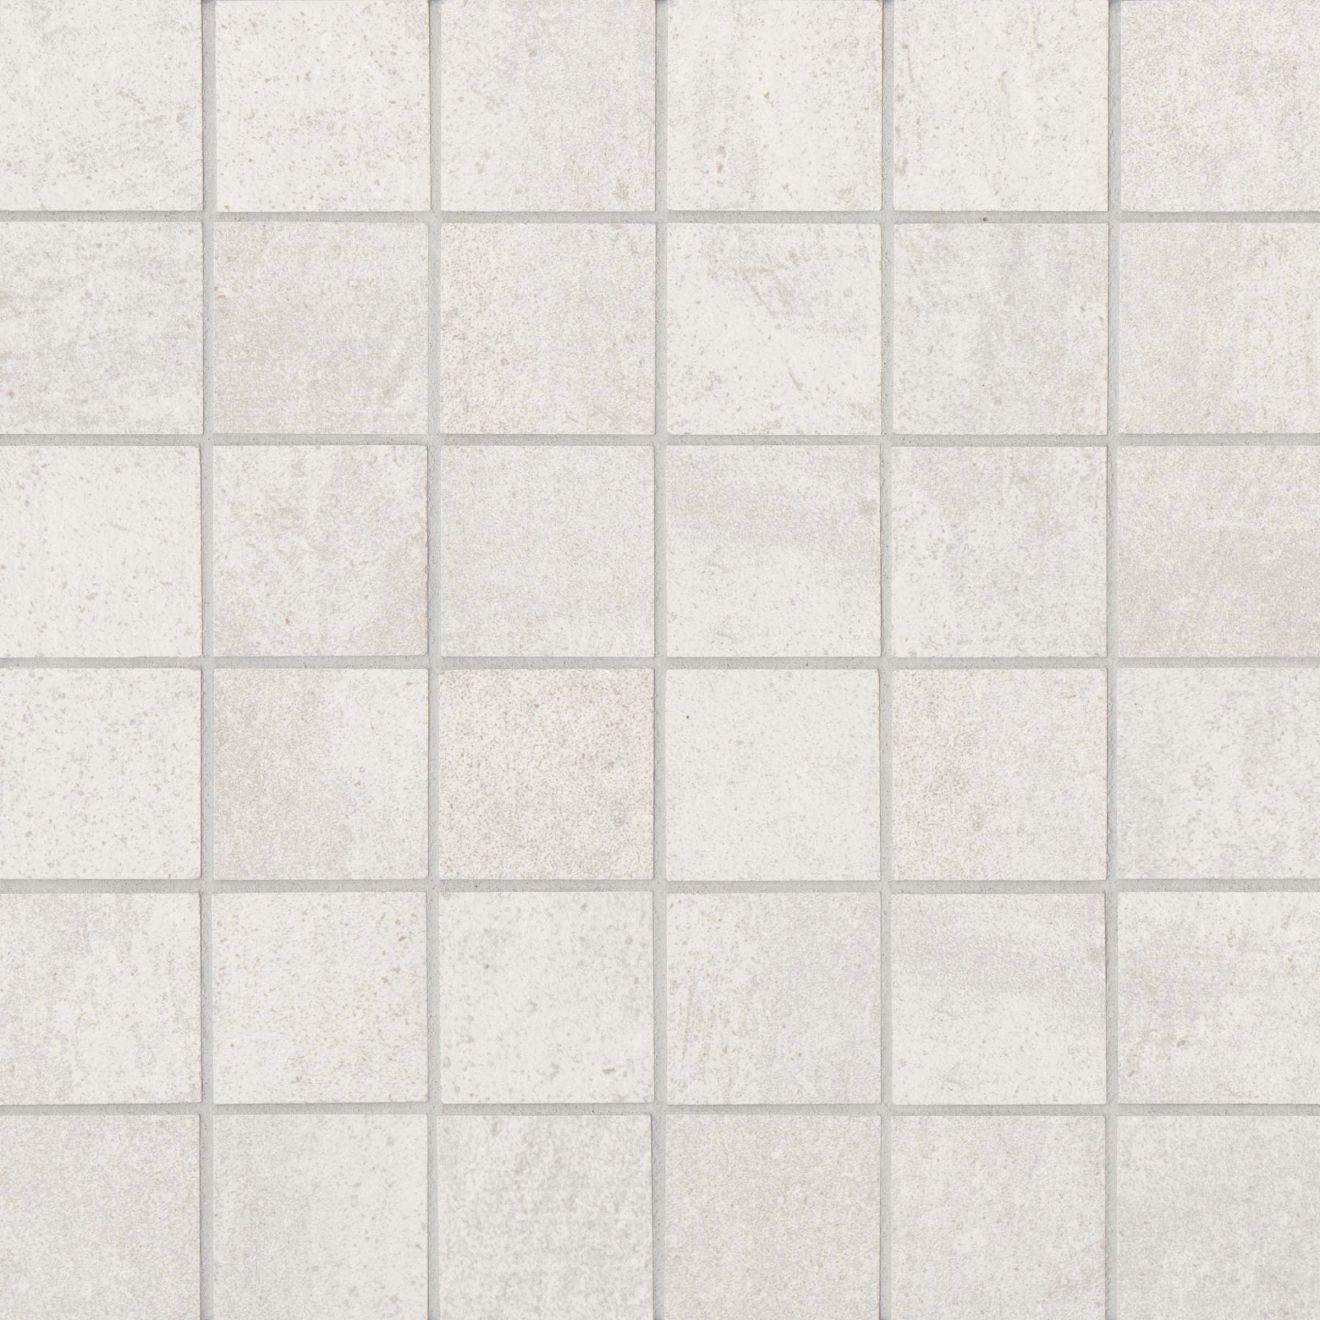 "Simply Modern 2"" x 2"" Floor & Wall Mosaic in Creme"